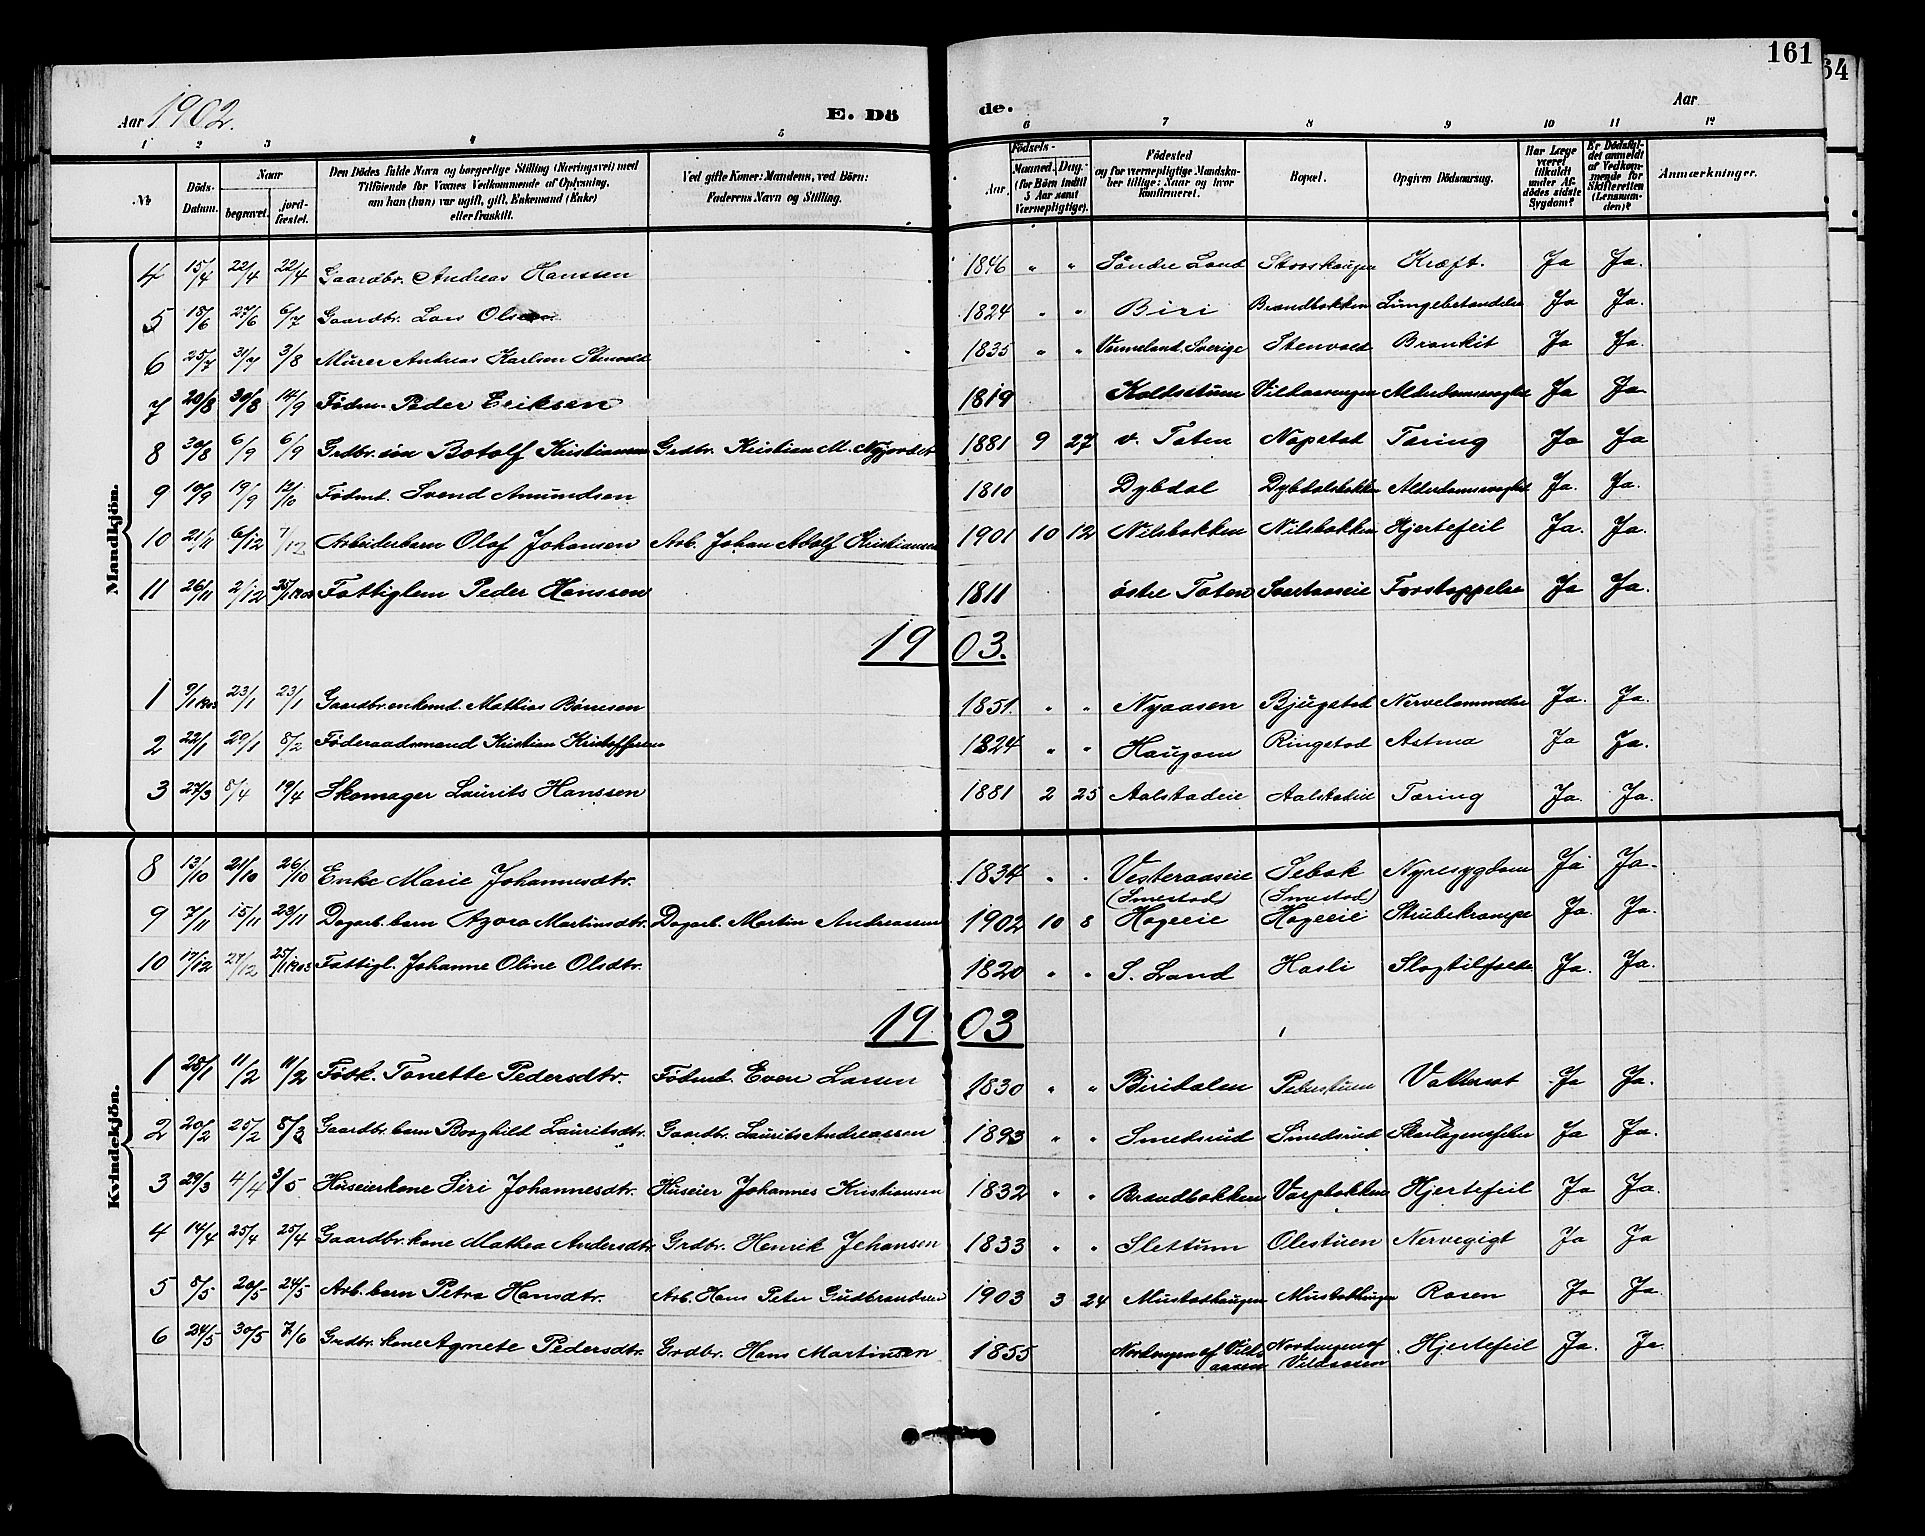 SAH, Vardal prestekontor, H/Ha/Hab/L0011: Klokkerbok nr. 11, 1899-1913, s. 161